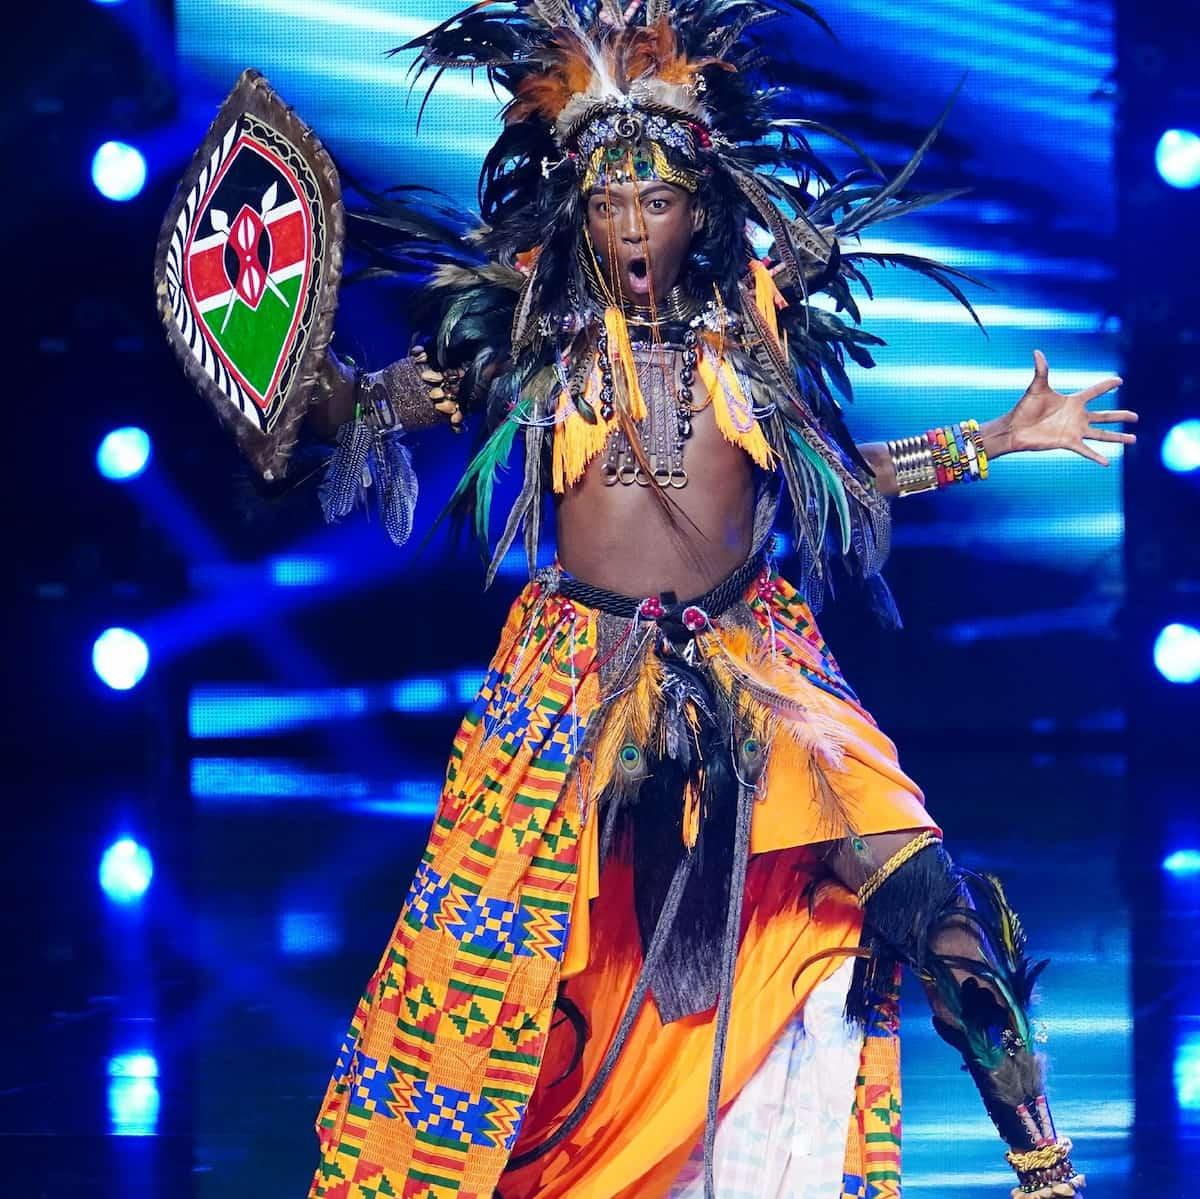 Karabo Morake - Kandidat beim Supertalent 9.10.2021